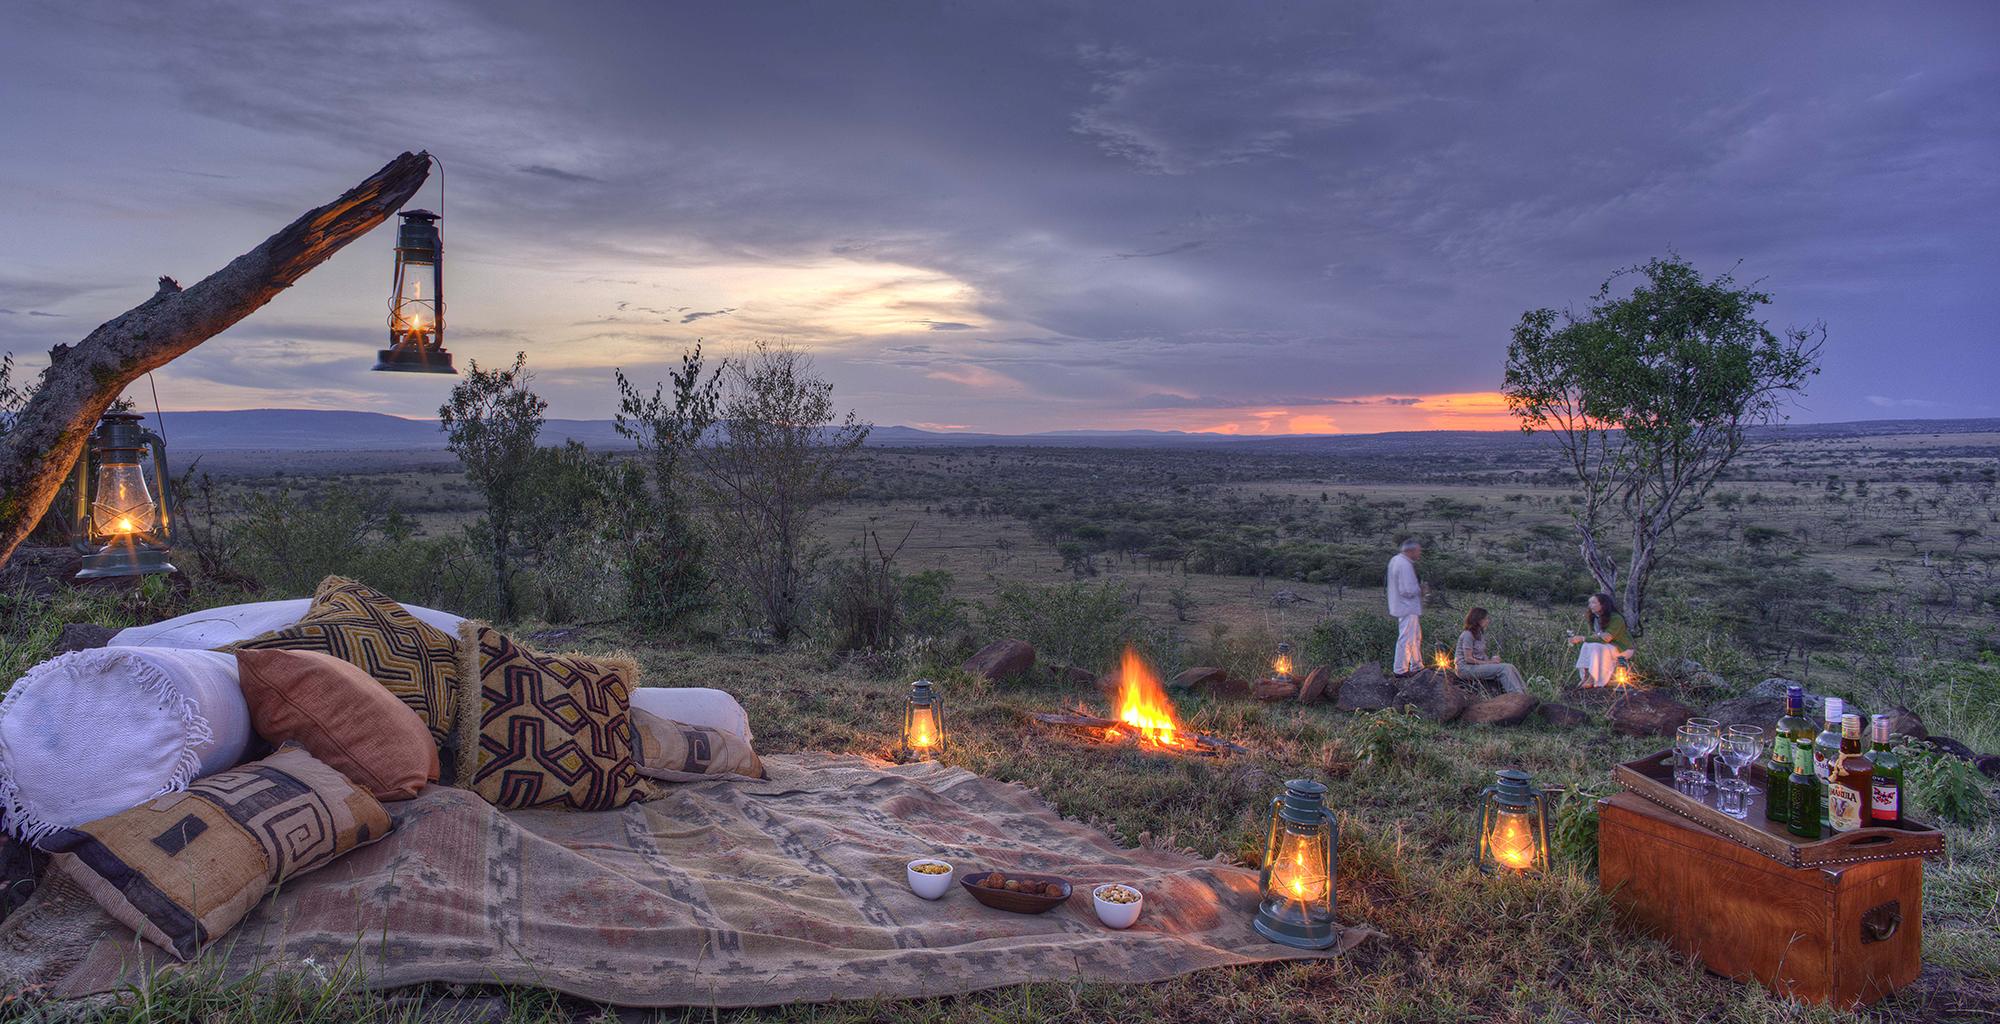 Kenya-Kicheche-Valley-Camp-Sunset